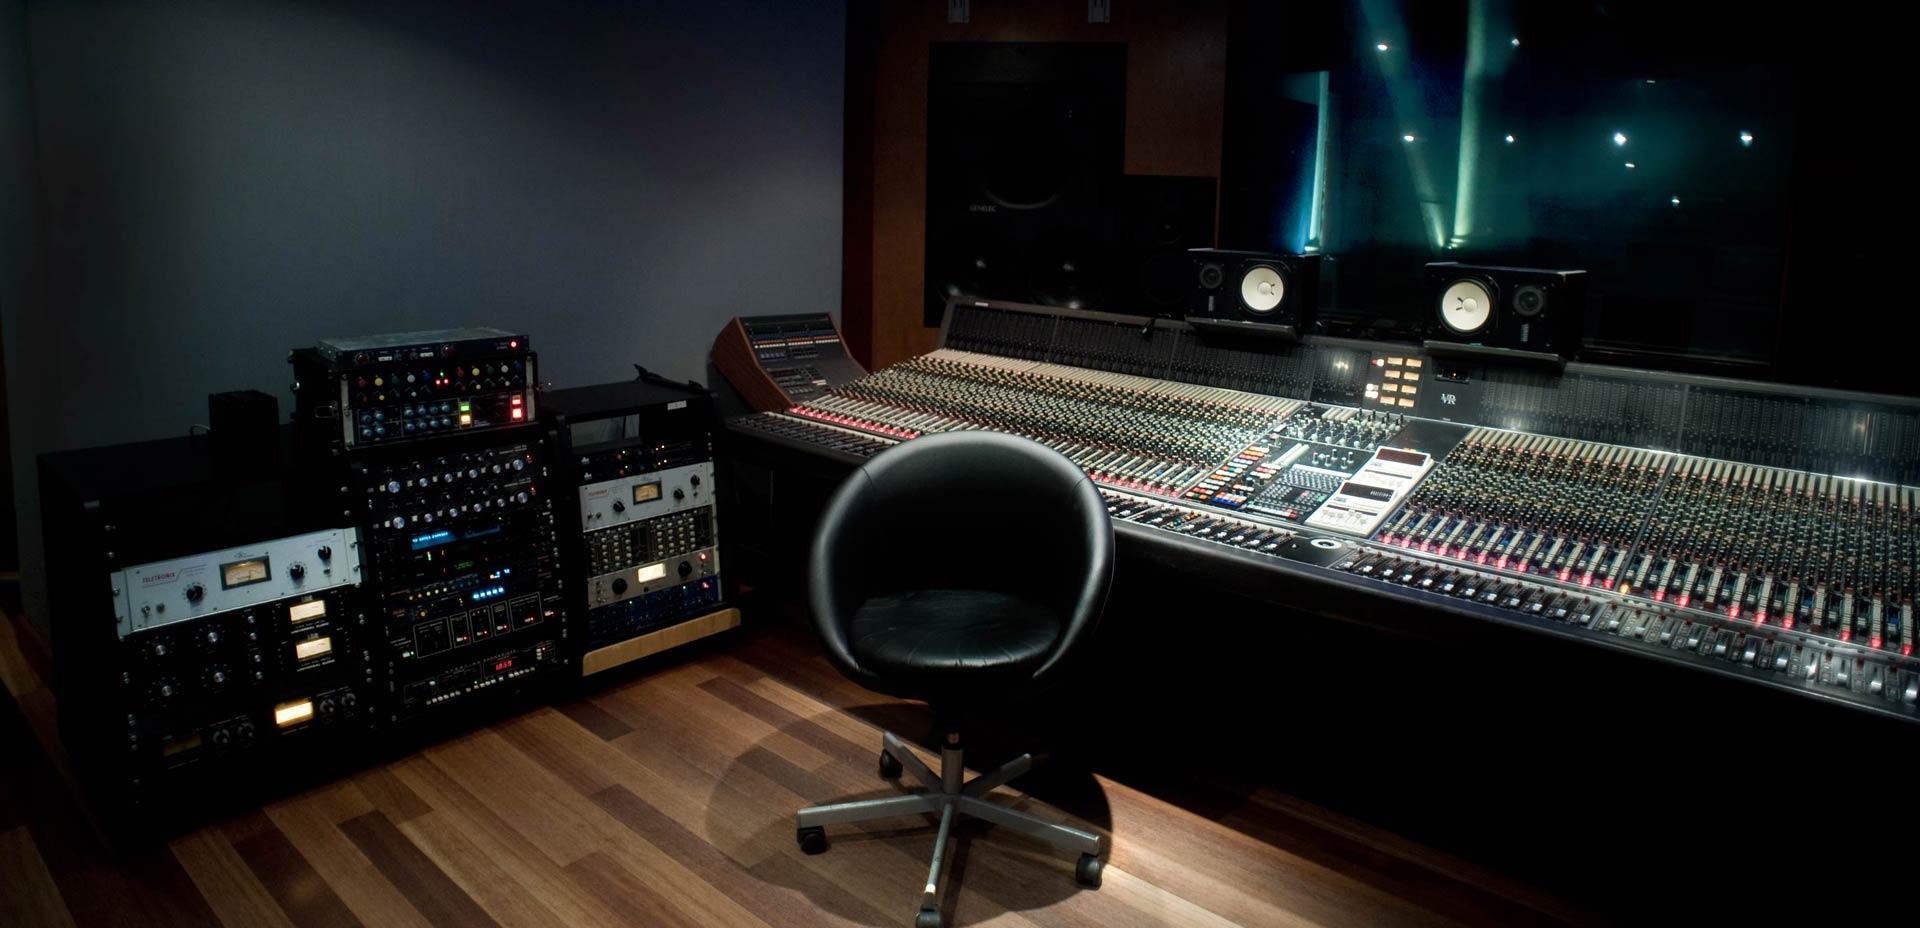 Cool Recording Studio Wallpapers 1920x928